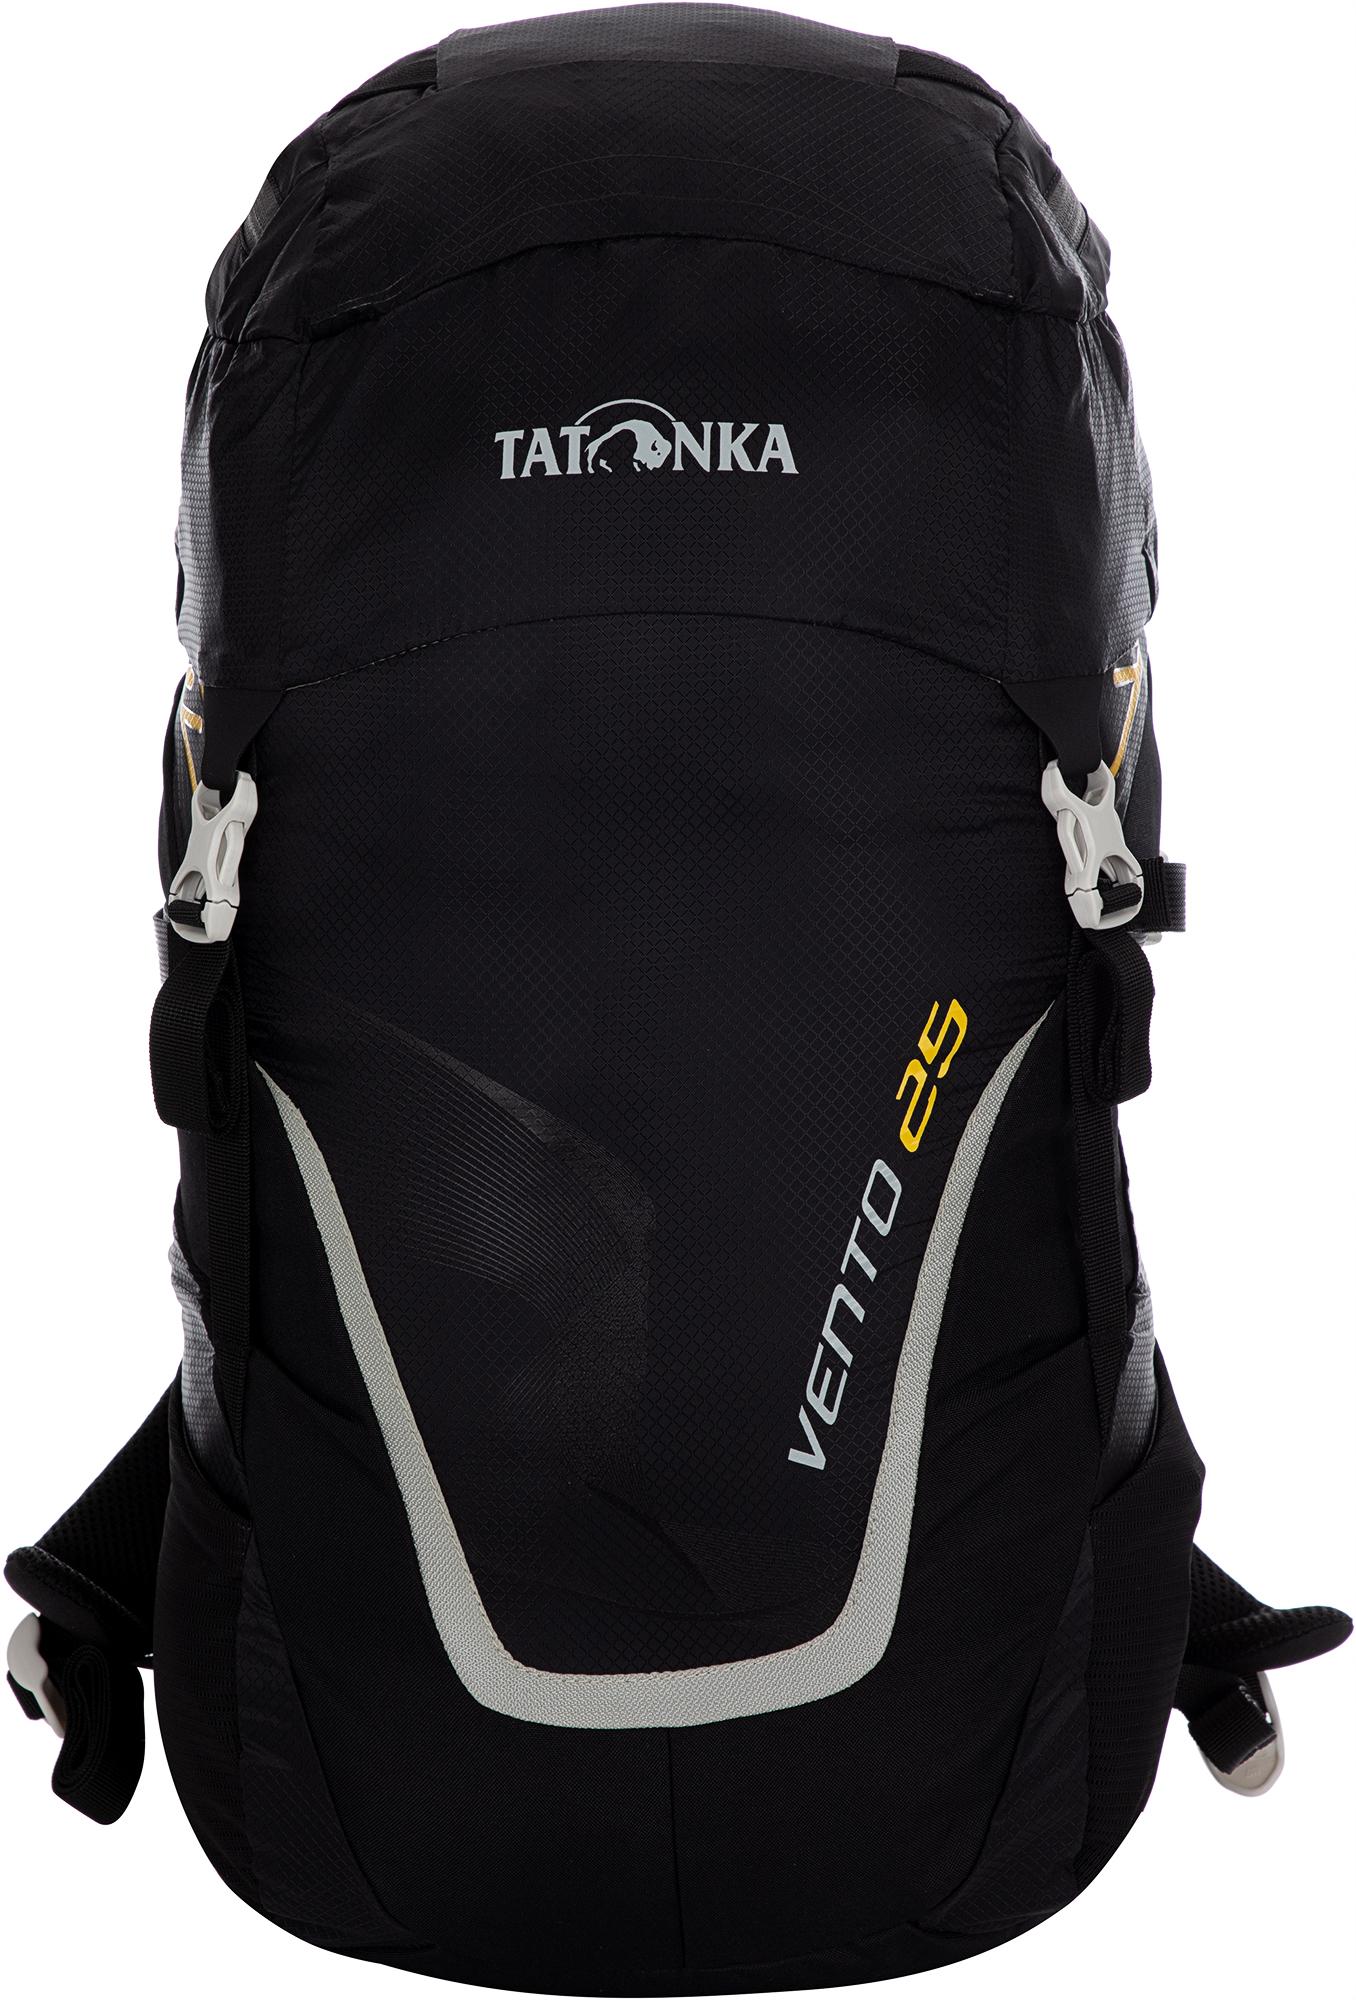 Tatonka Tatonka VENTO 25 tatonka сумка tatonka barrel xxl